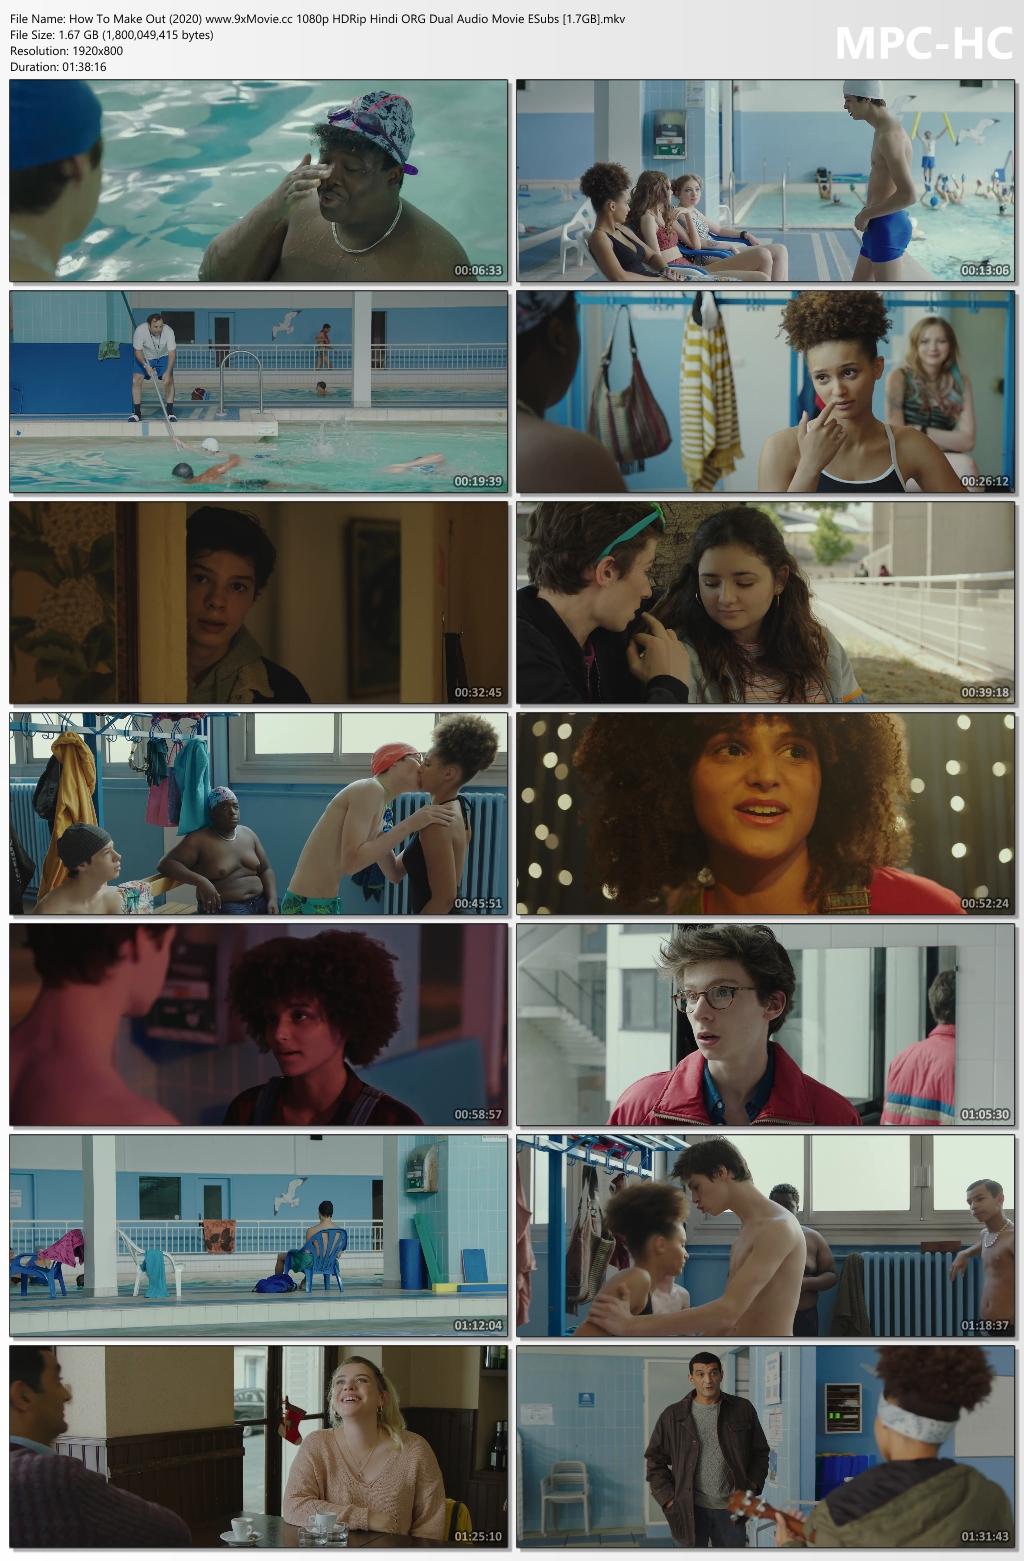 How-To-Make-Out-2020-www-9x-Movie-cc-1080p-HDRip-Hindi-ORG-Dual-Audio-Movie-ESubs-1-7-GB-mkv